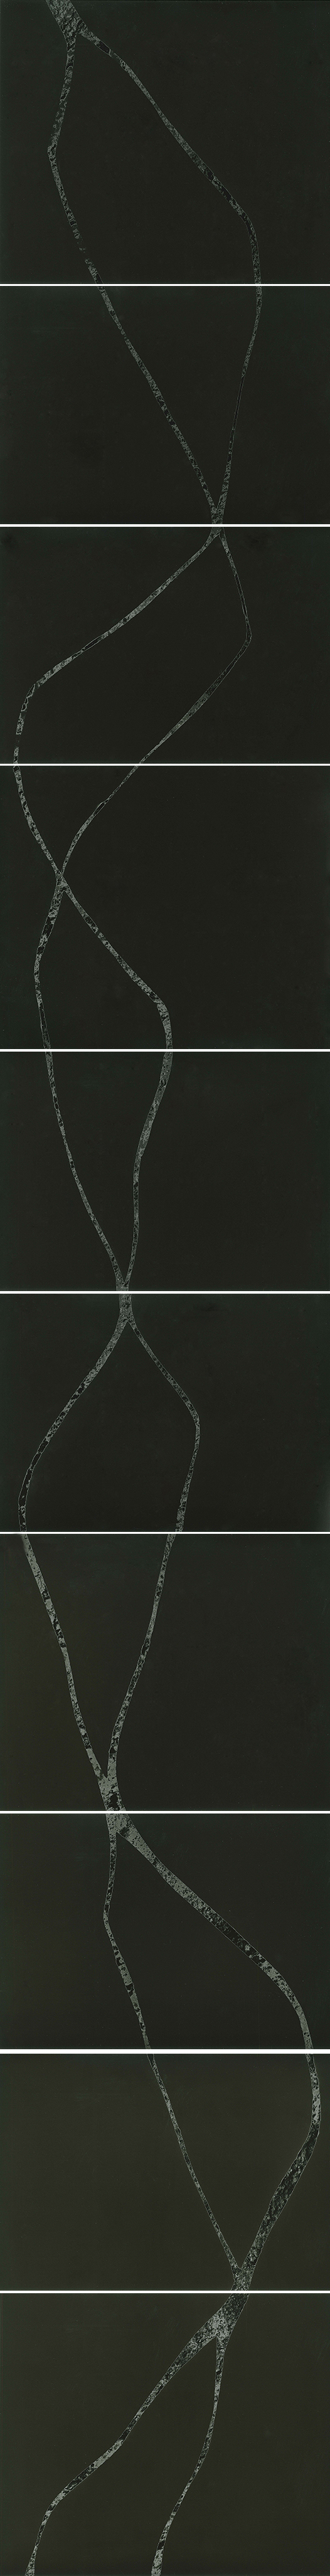 Copy of Confine #270 (260-261-262-263-264-265-266-267-268-269) by Vittoria Gerardi